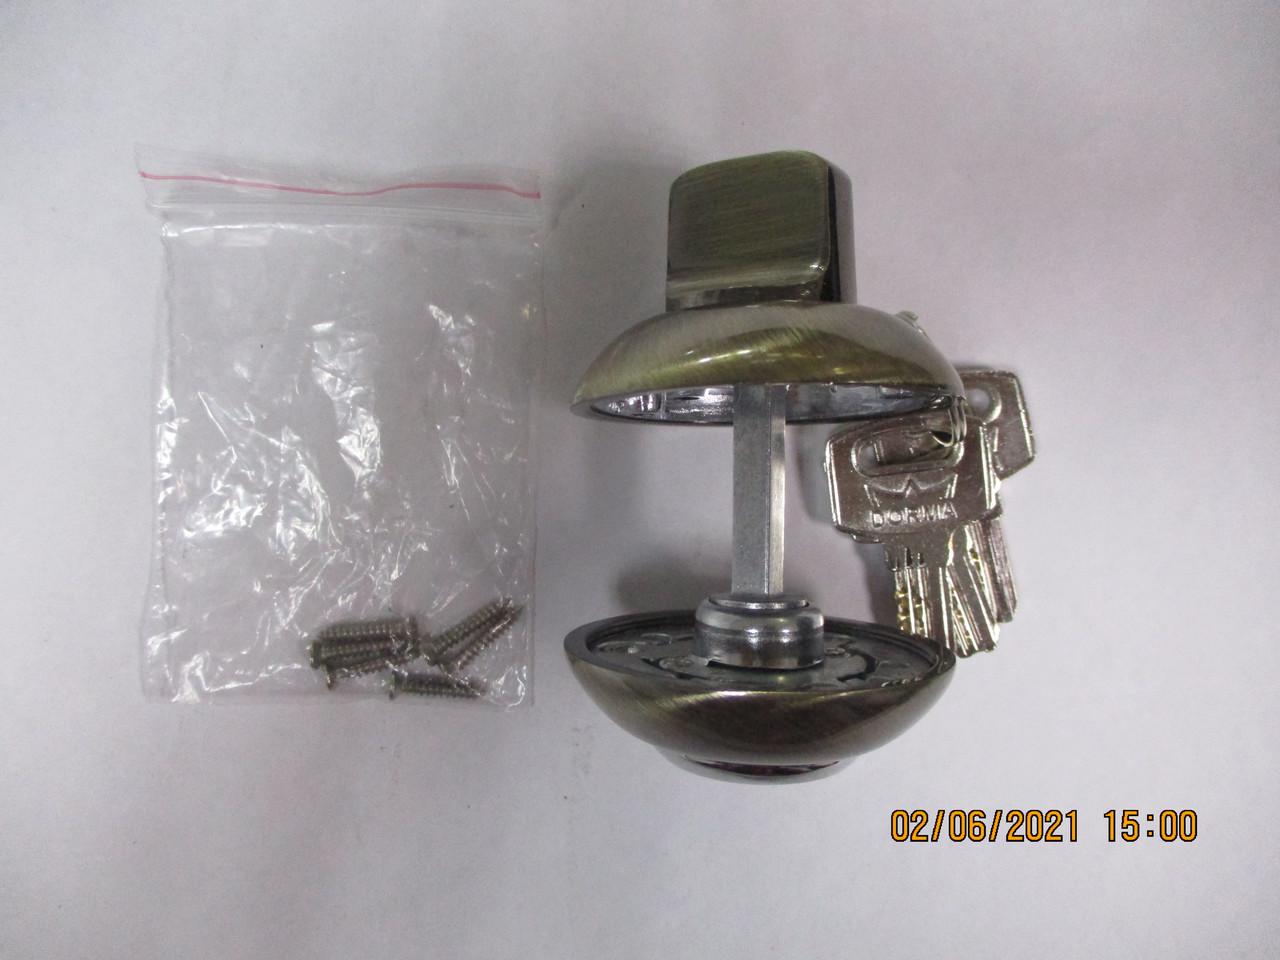 Фиксатор ключ R AB/CP DORMA (20/40) - фото 1